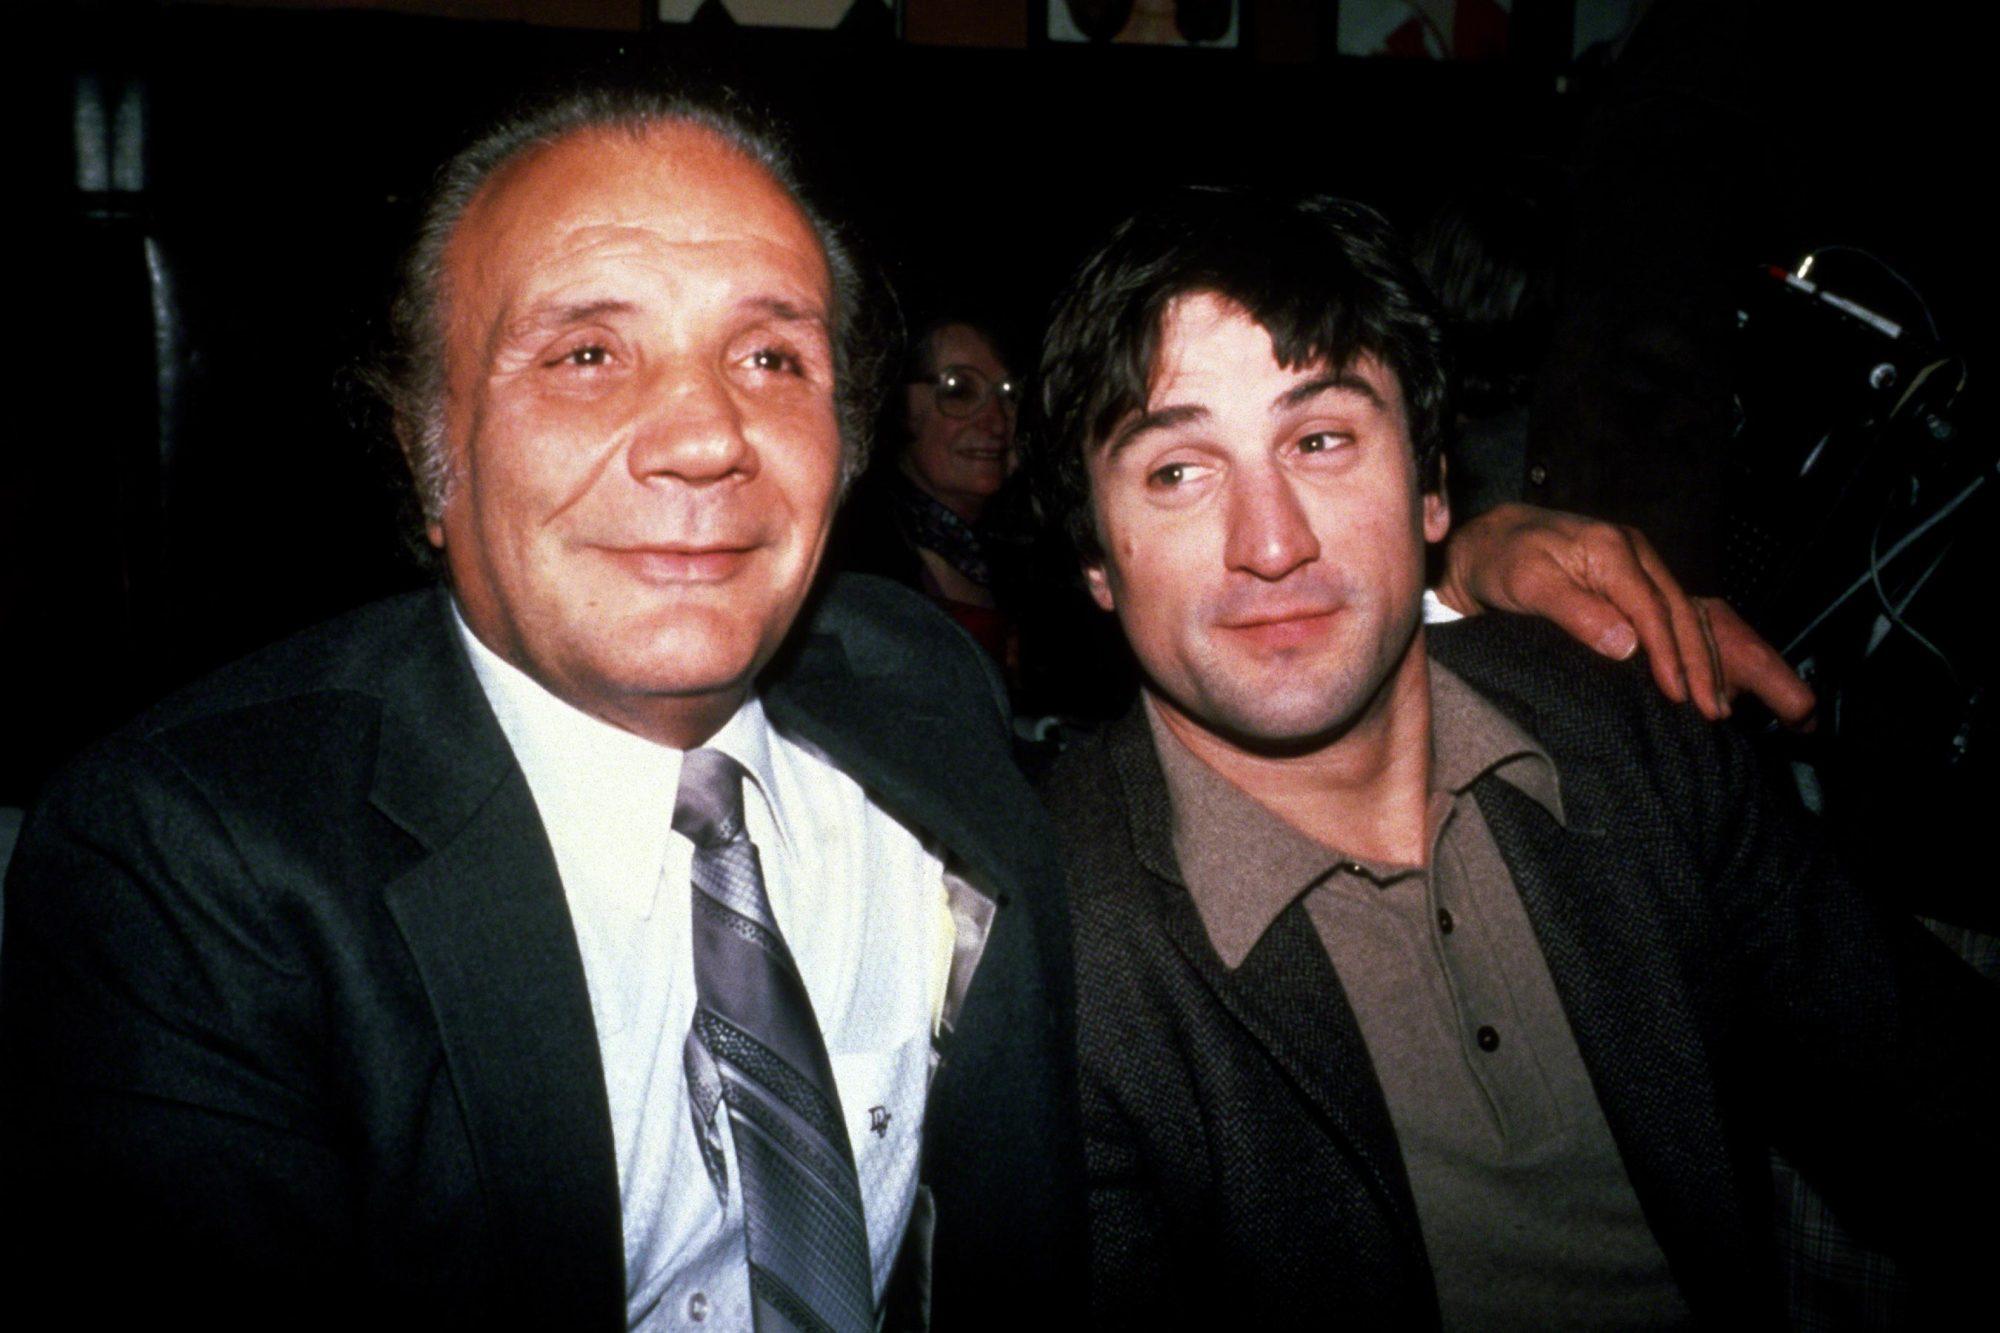 Jake LaMotta and Robert De Niro at Sardi's